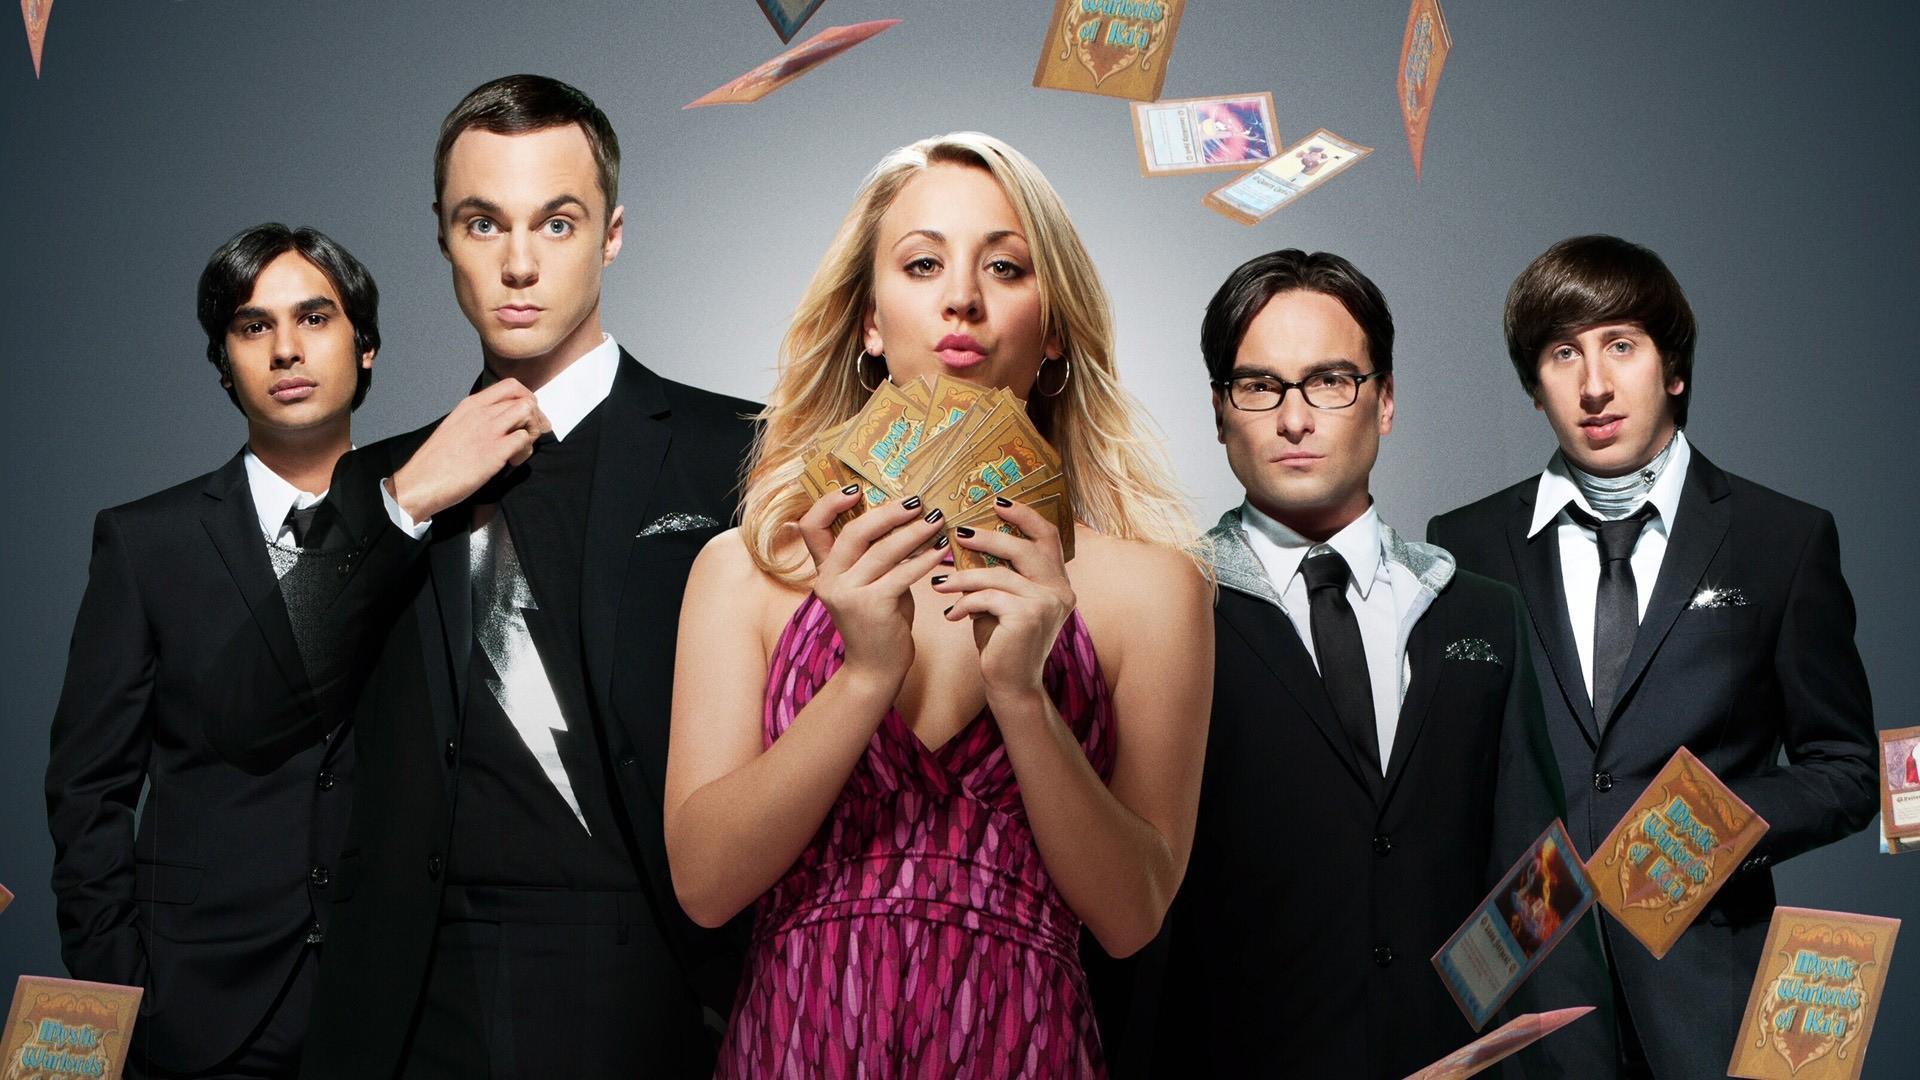 Res: 1920x1080, Die Big Bang Theory TV Series HD Wallpaper #1 - .